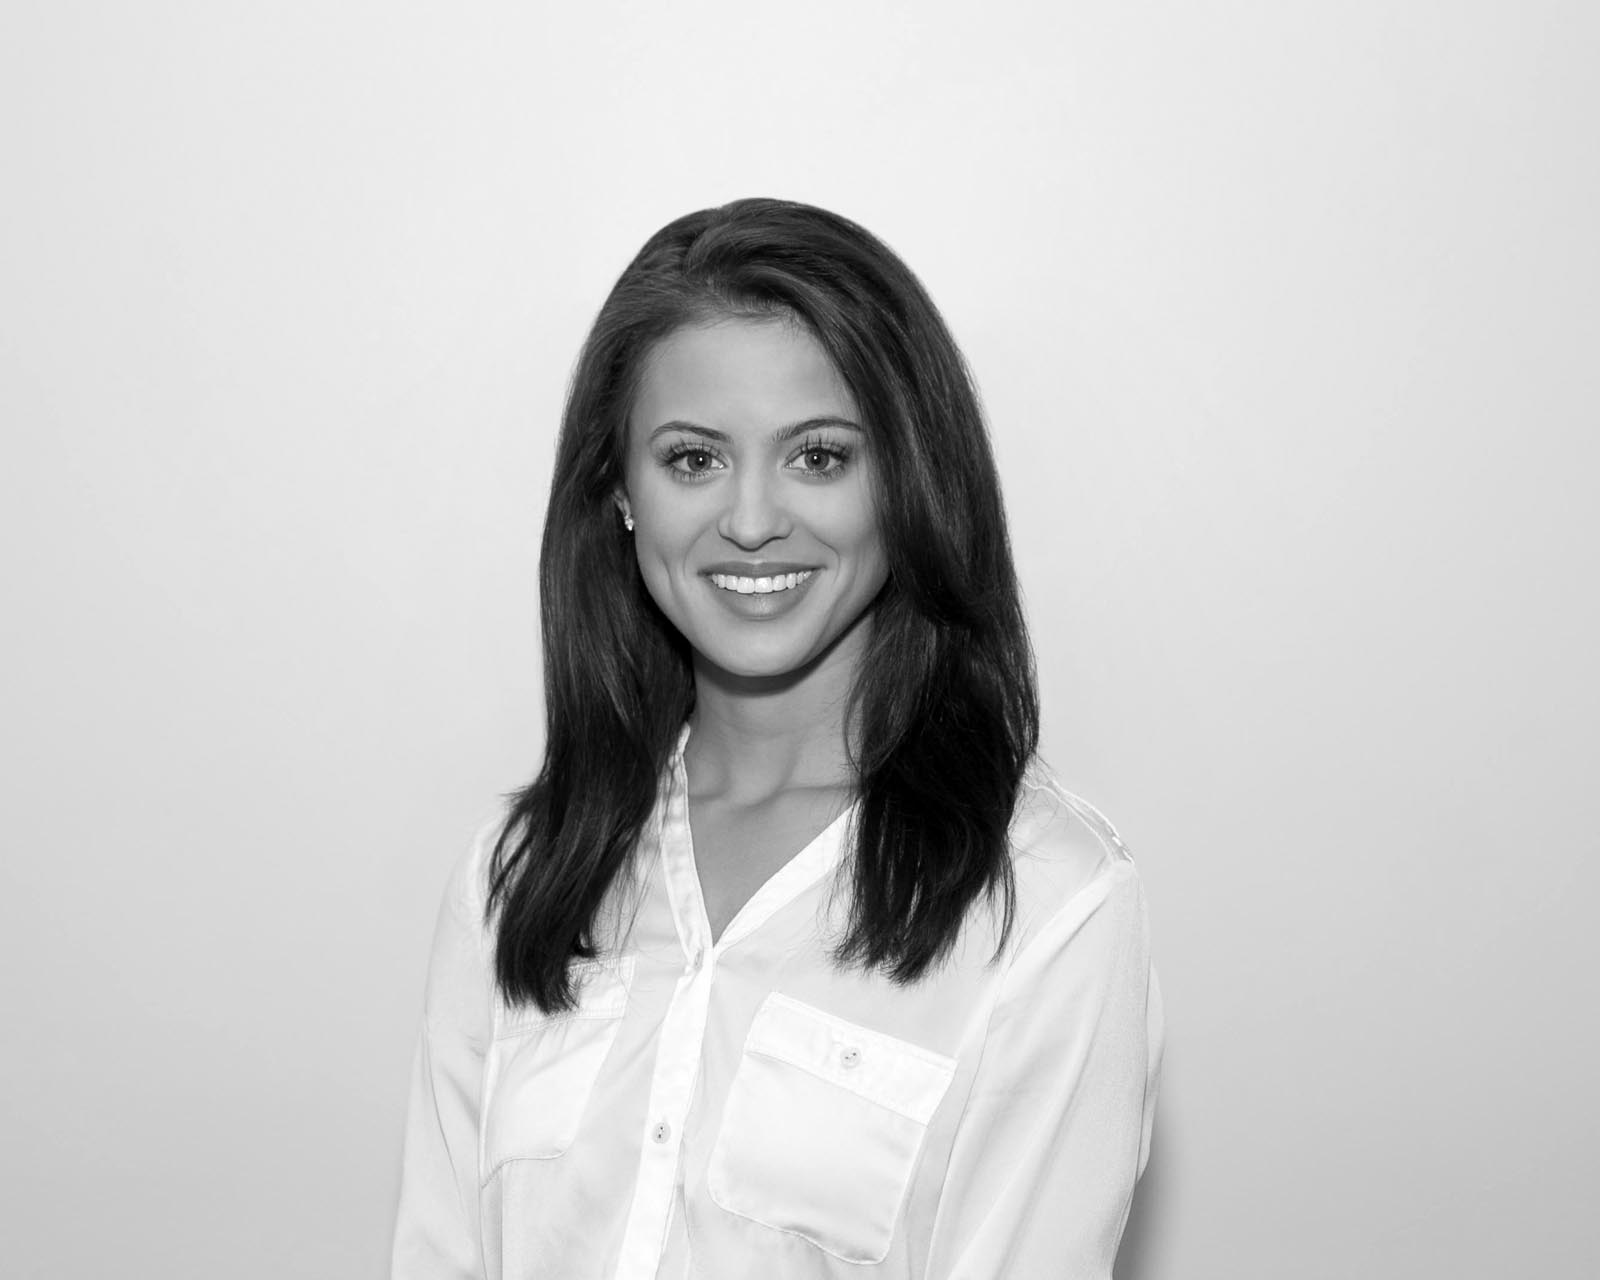 Amanda Talbott